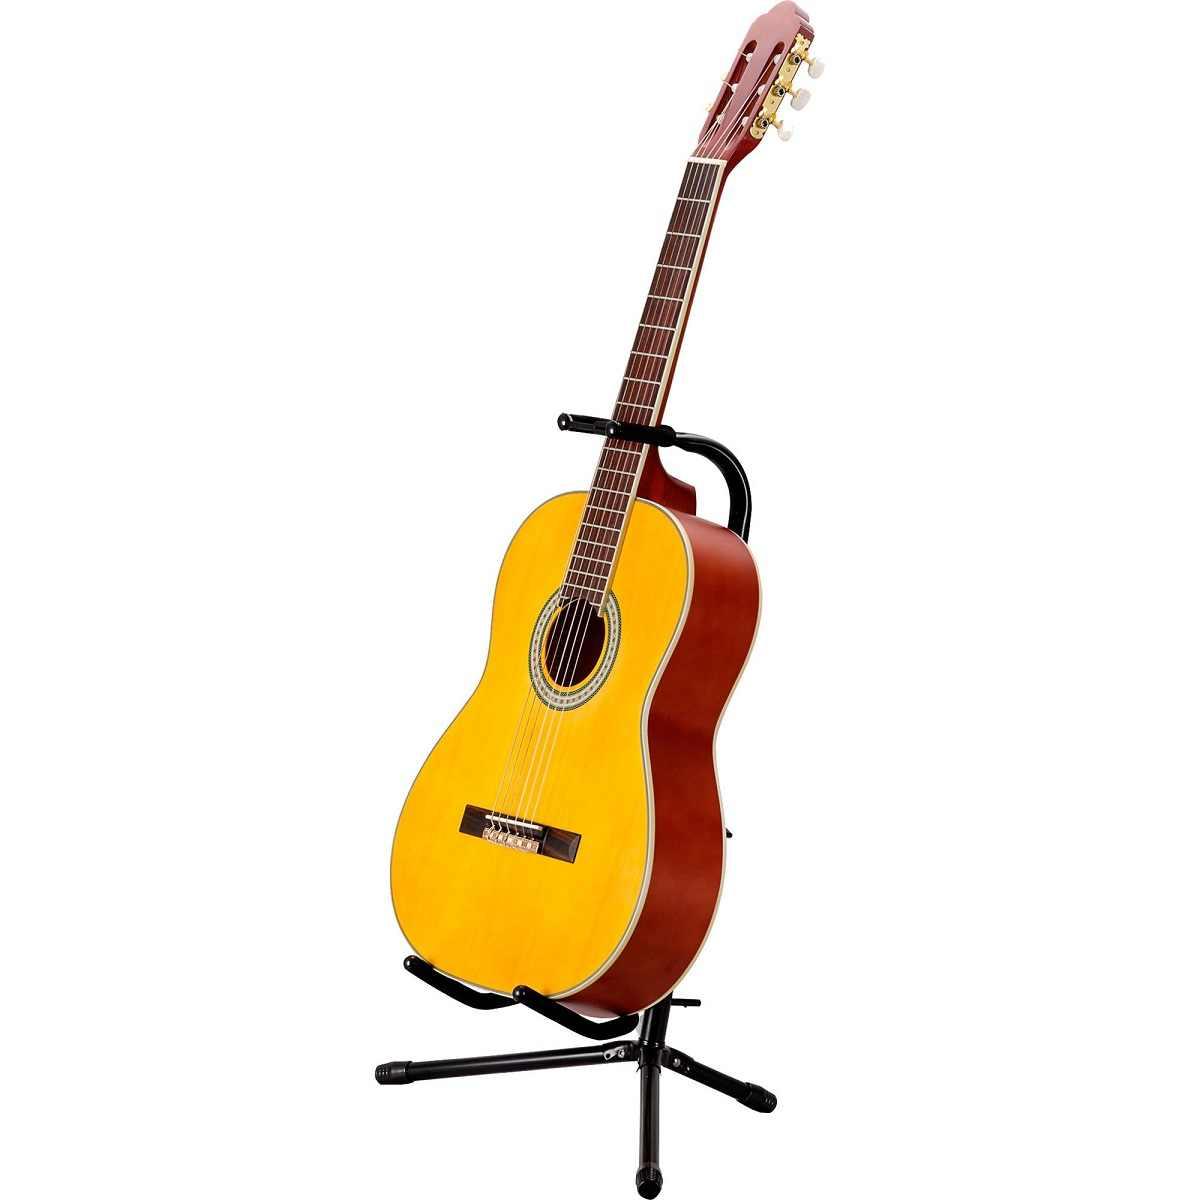 Suporte para Instrumentos de Corda Violão-Guitarra-Contrabaixo SI300 Hayonik